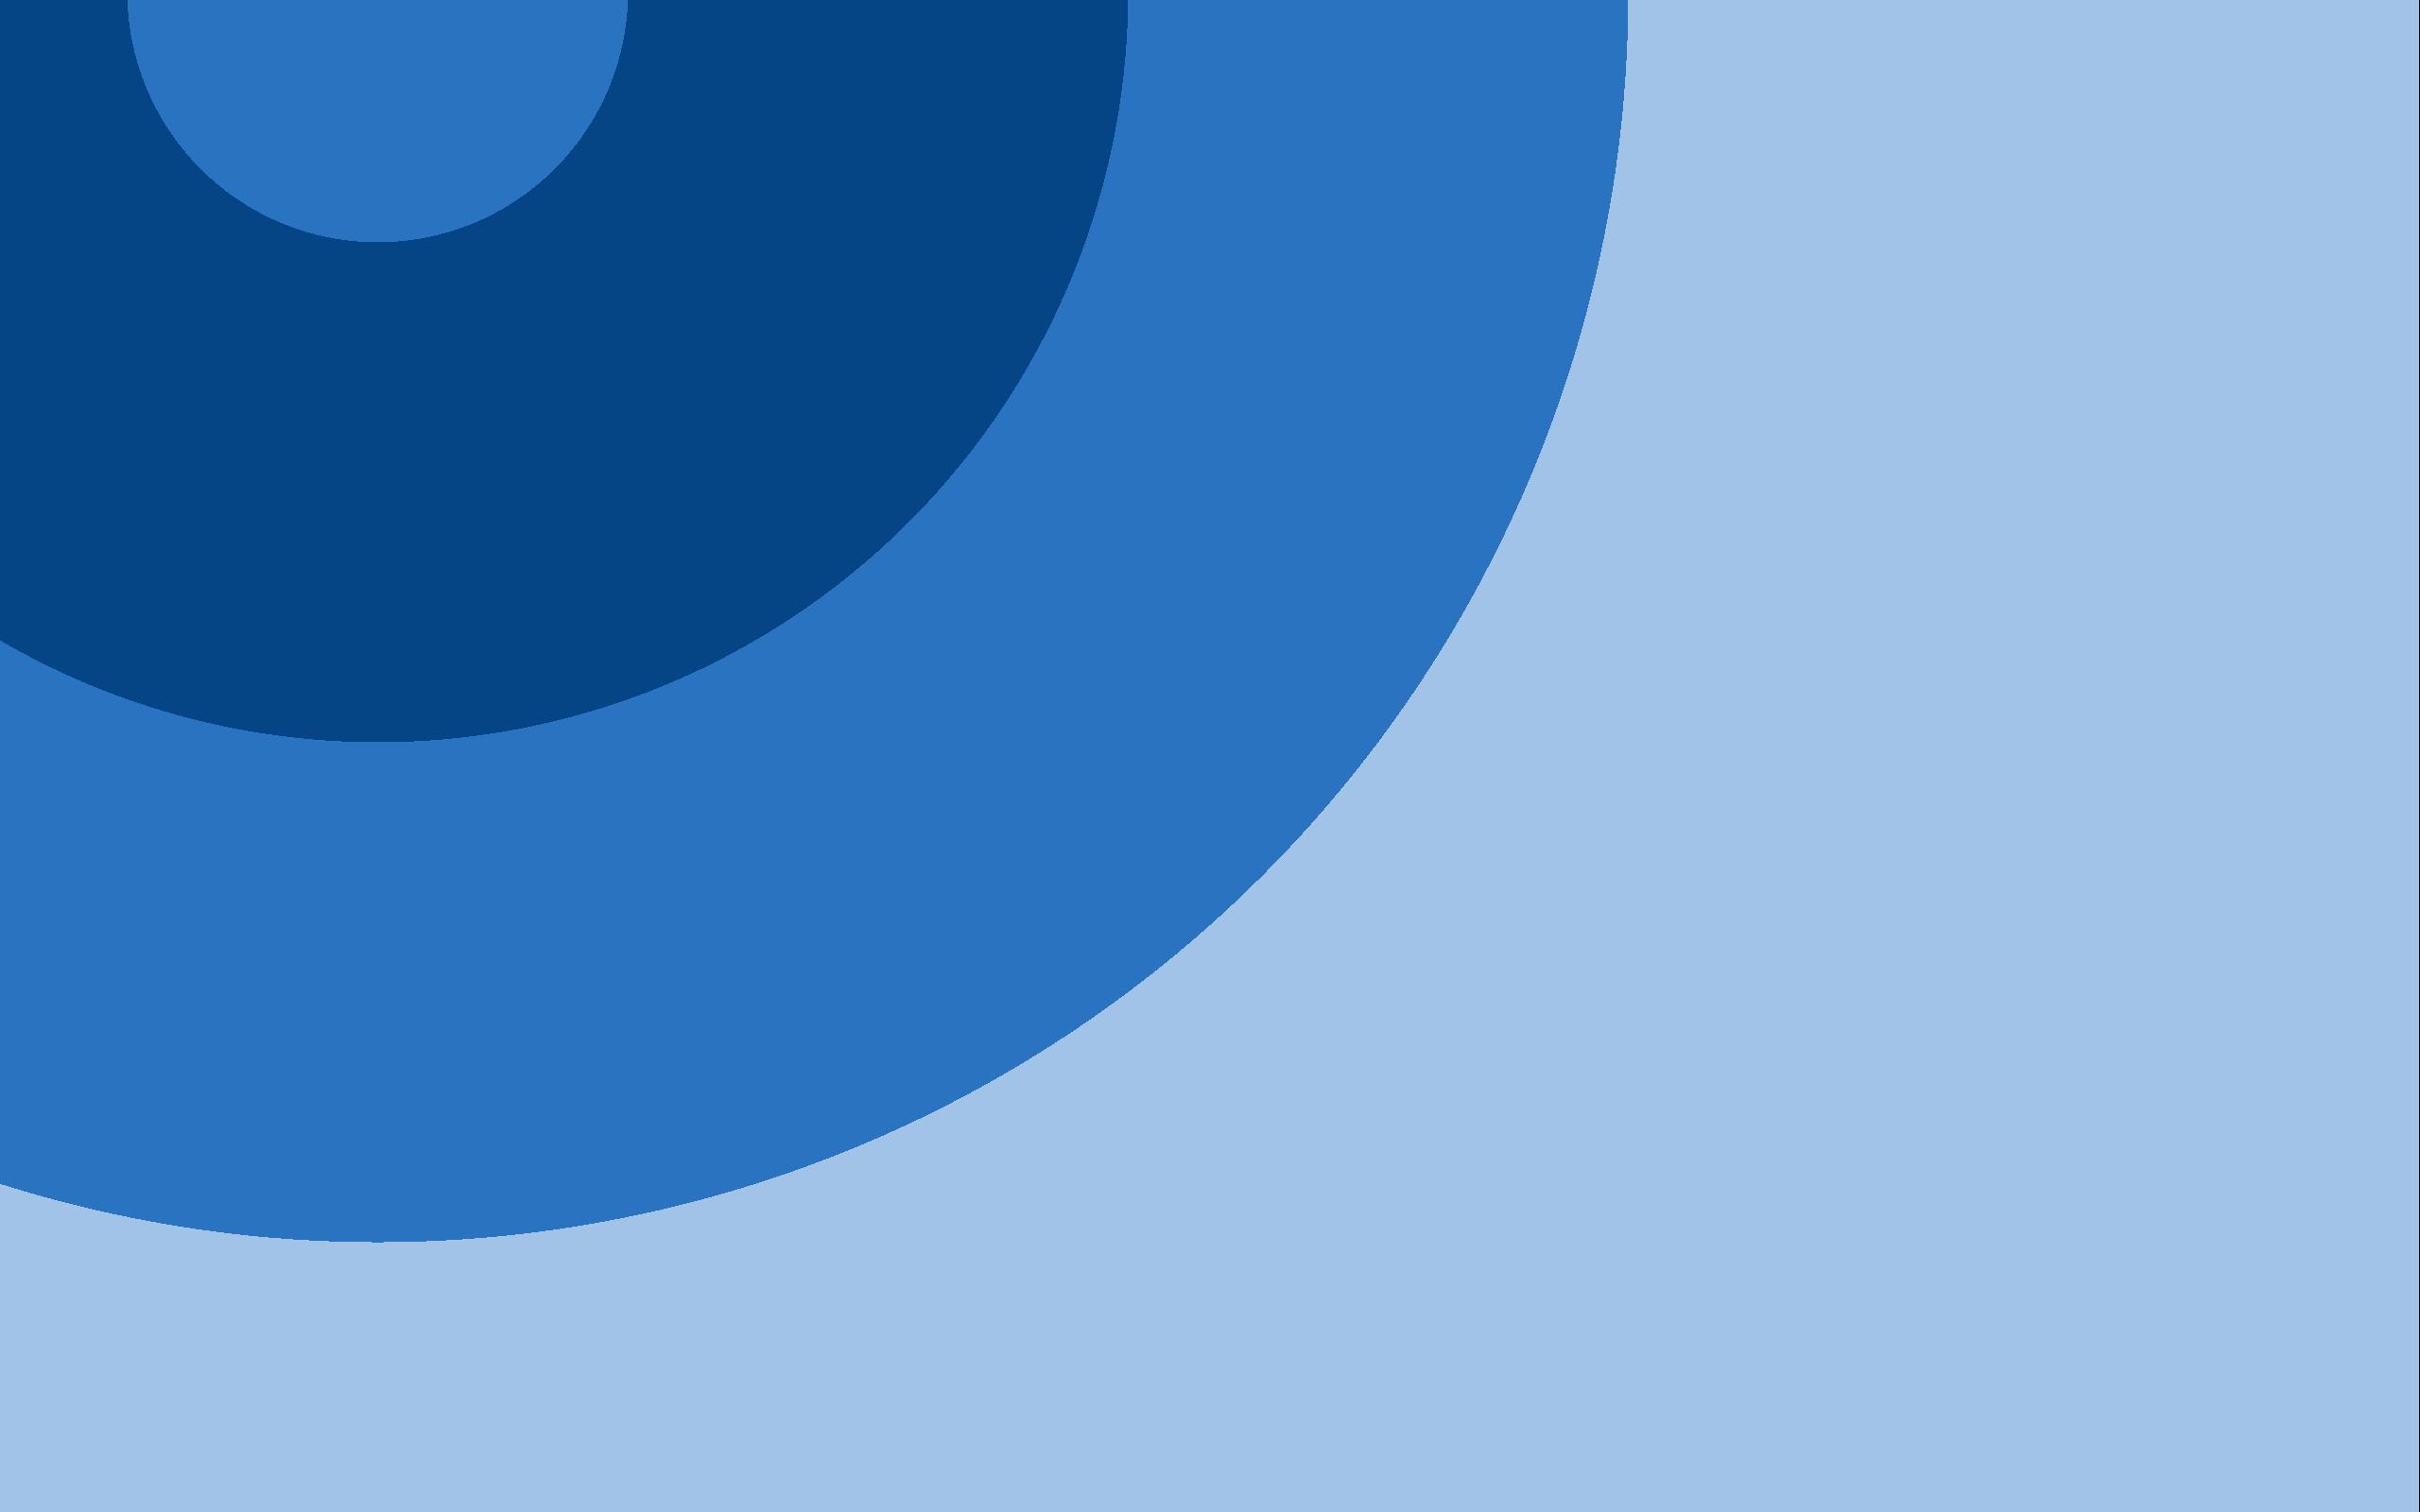 assets/images/bg/tango-circle-bg-blue.png